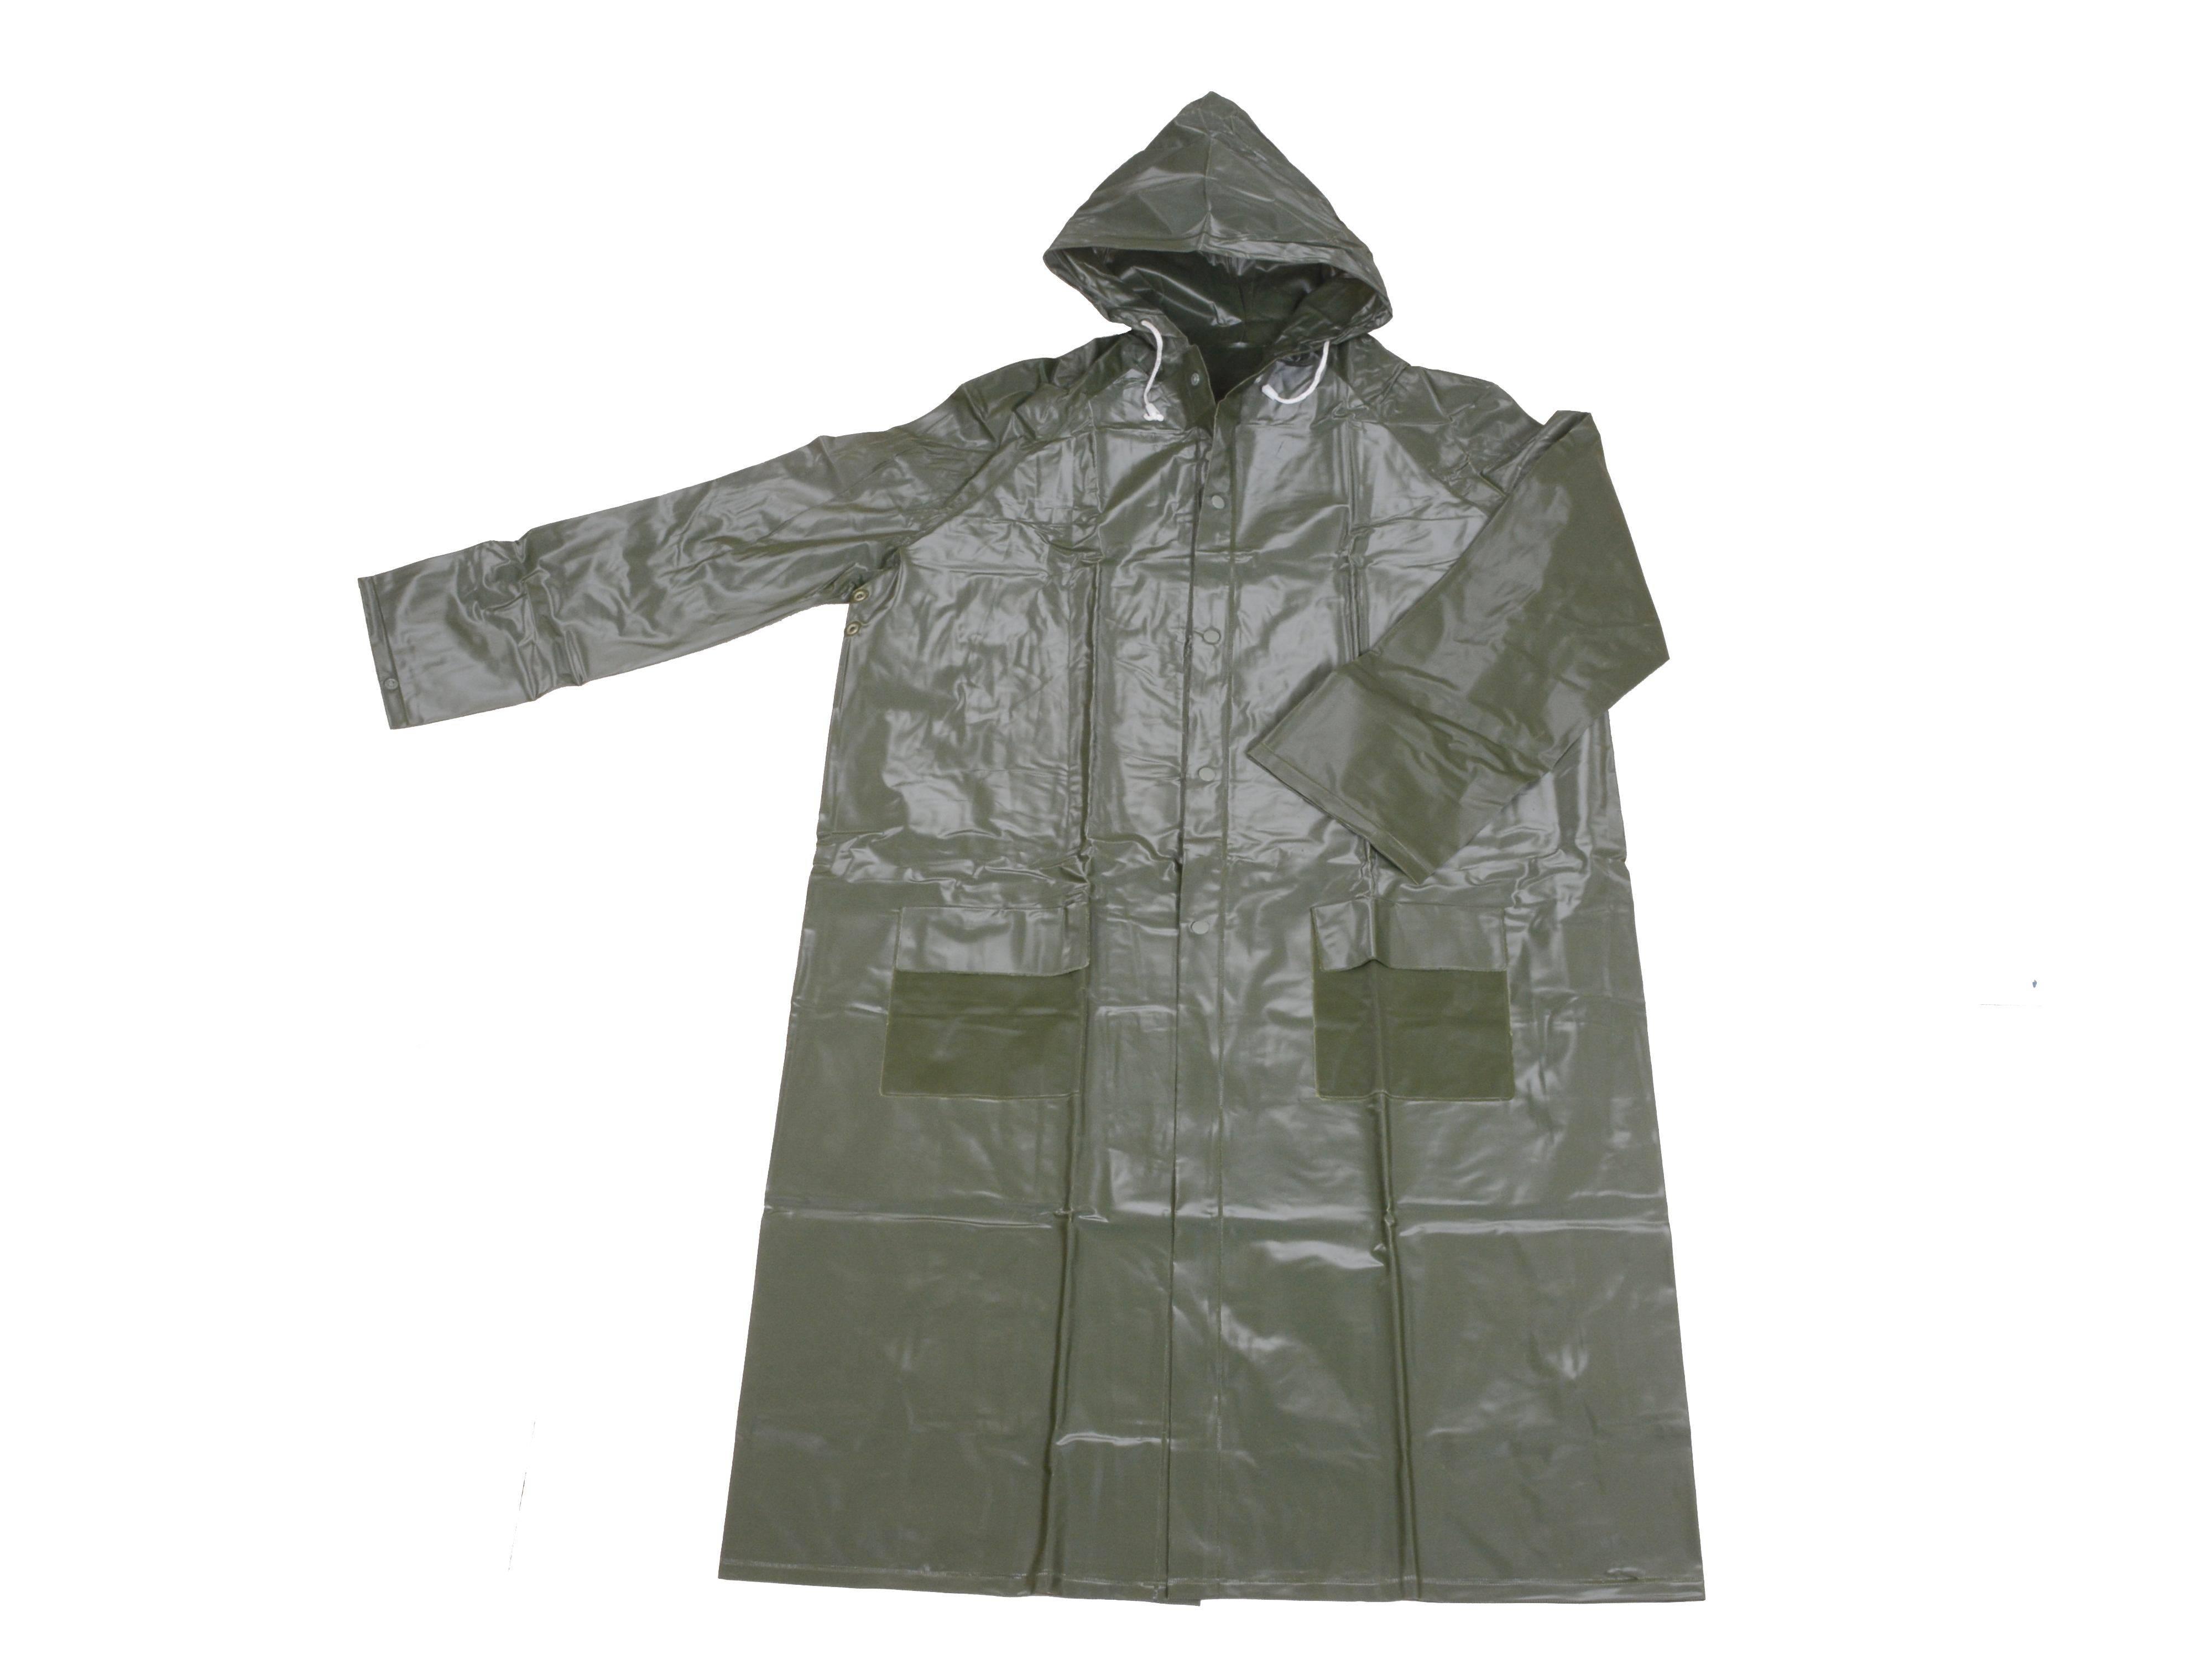 R-1056-9 GREEN HEAVY DUTY PVC VINYL LONG RAIN JACKETS FOR MEN